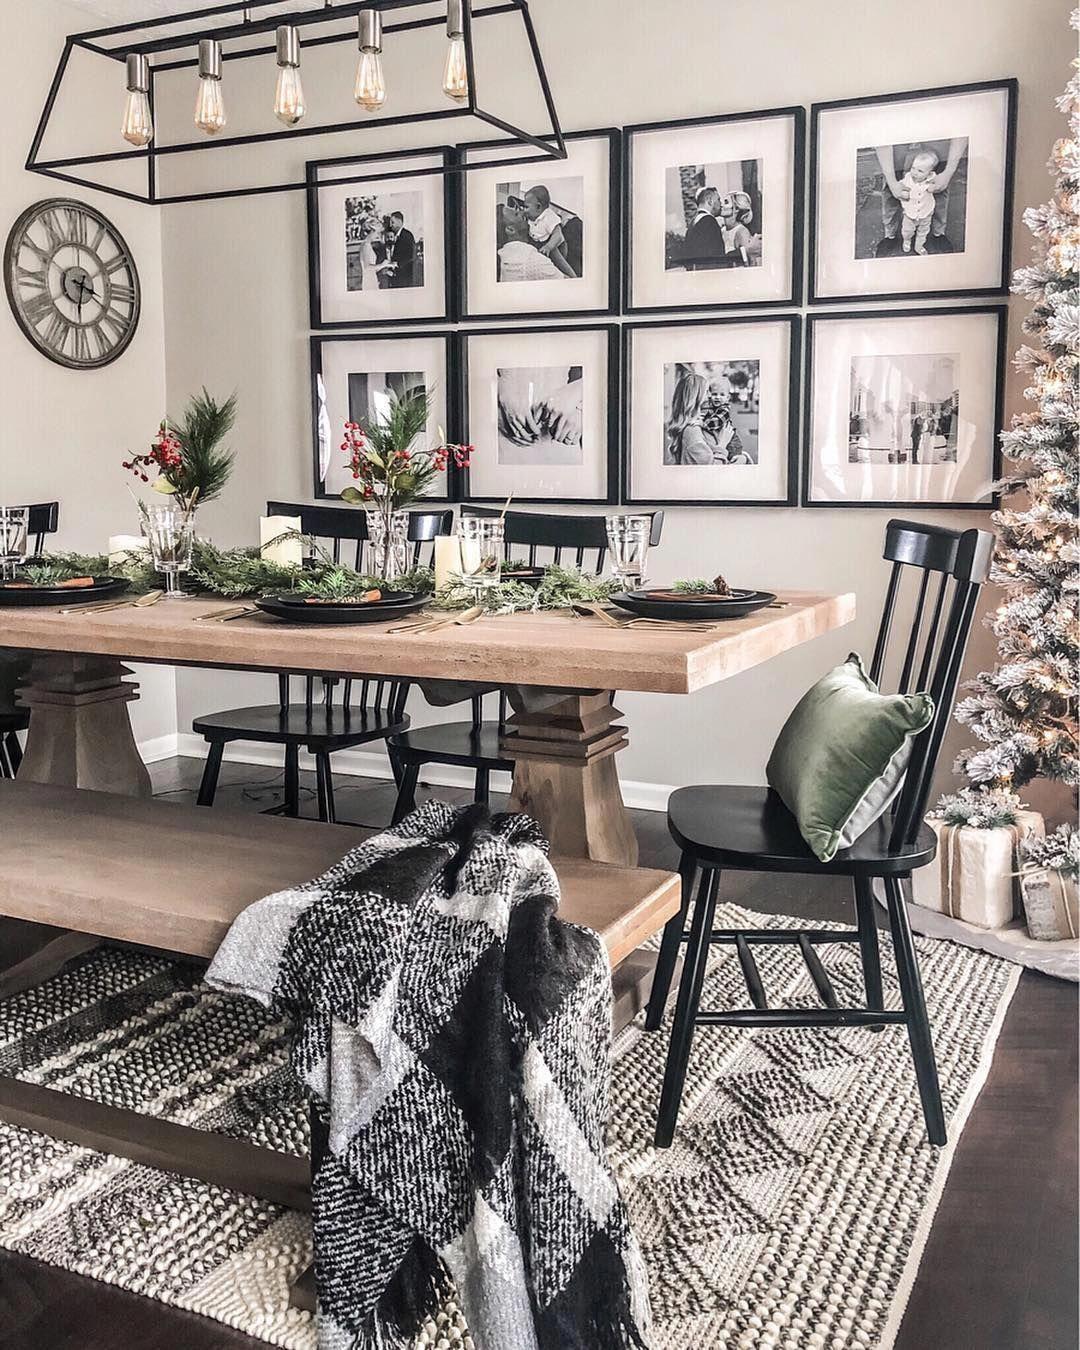 Casual Dining Room Decor Ideas: Home Decor Themes HomeDecor 836684437008240876